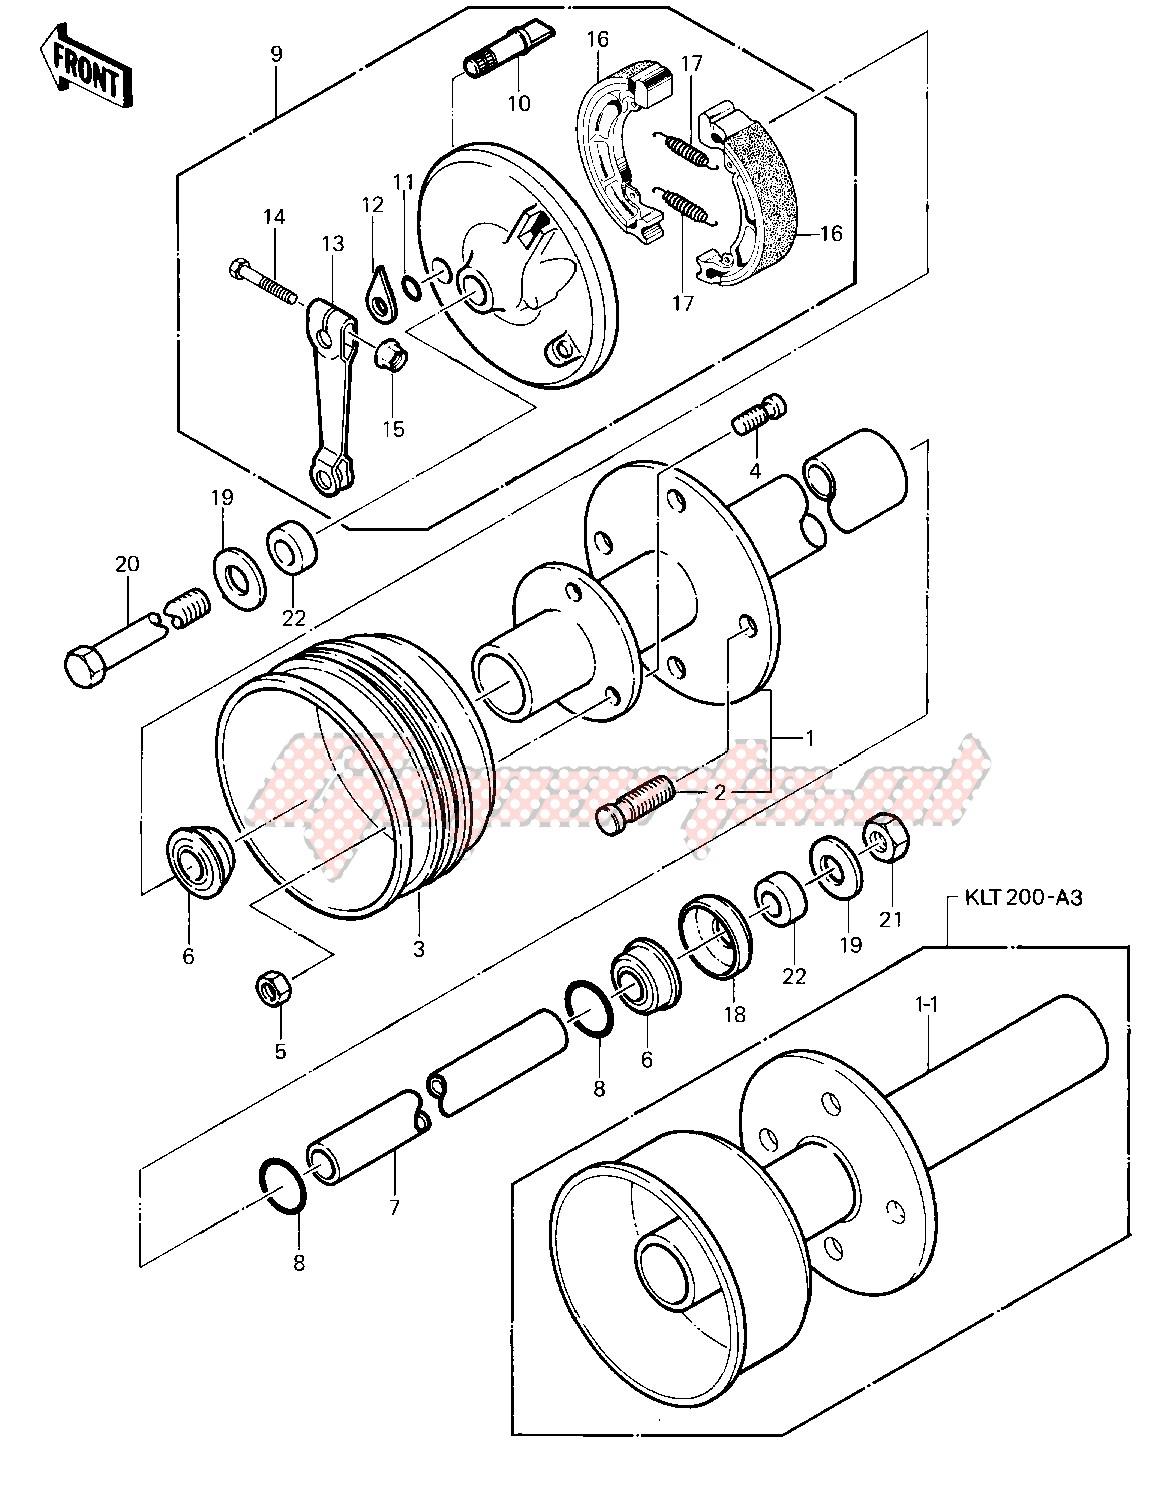 FRONT HUB_BRAKE -- 81-82 KLT200-A1_A2_A3- - image